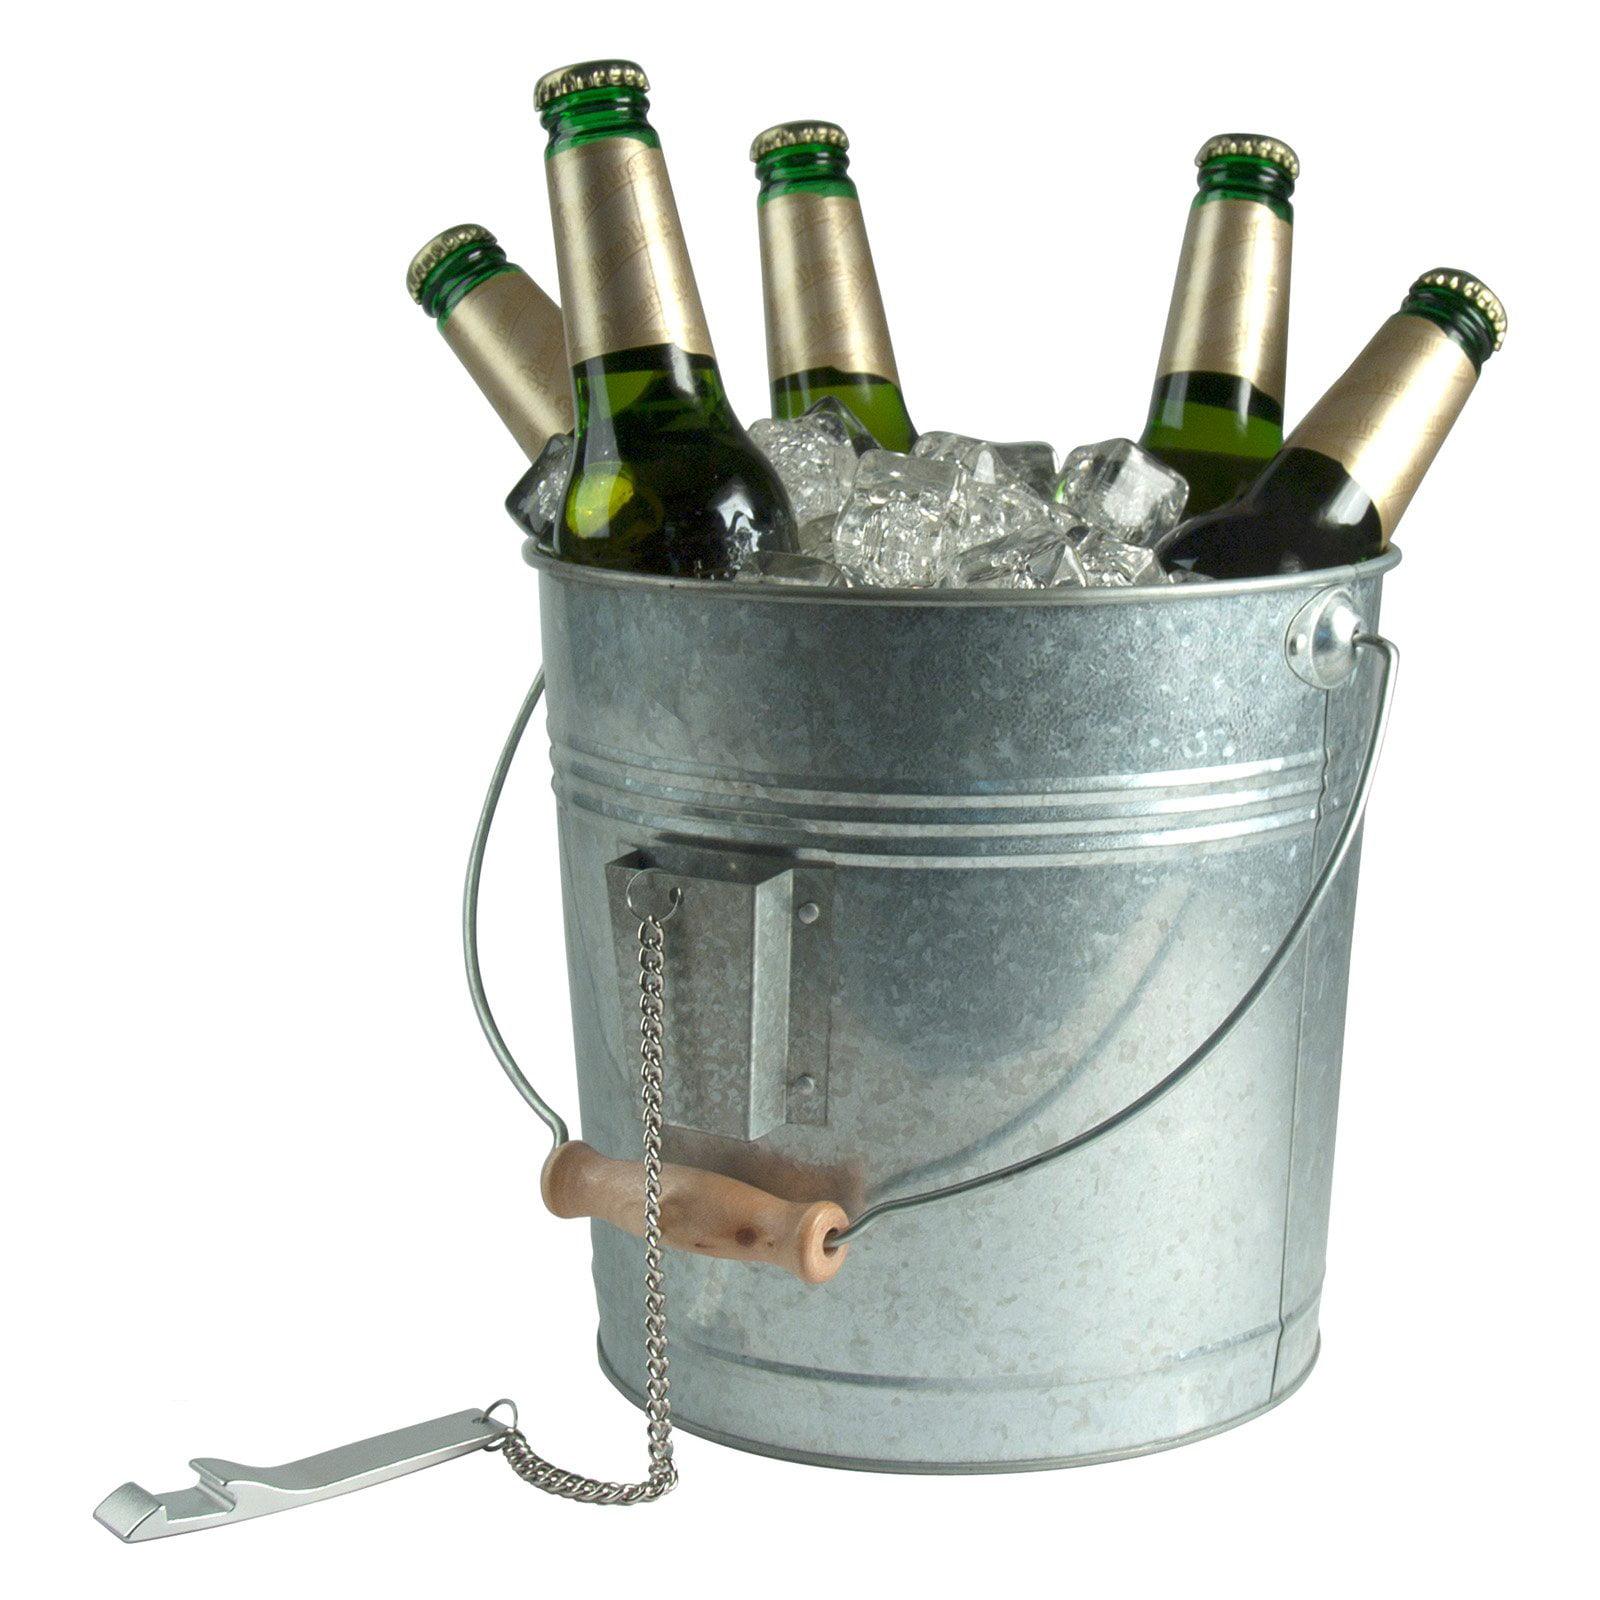 Artland Inc. Oasis Galvanized Beverage Pail with Opener